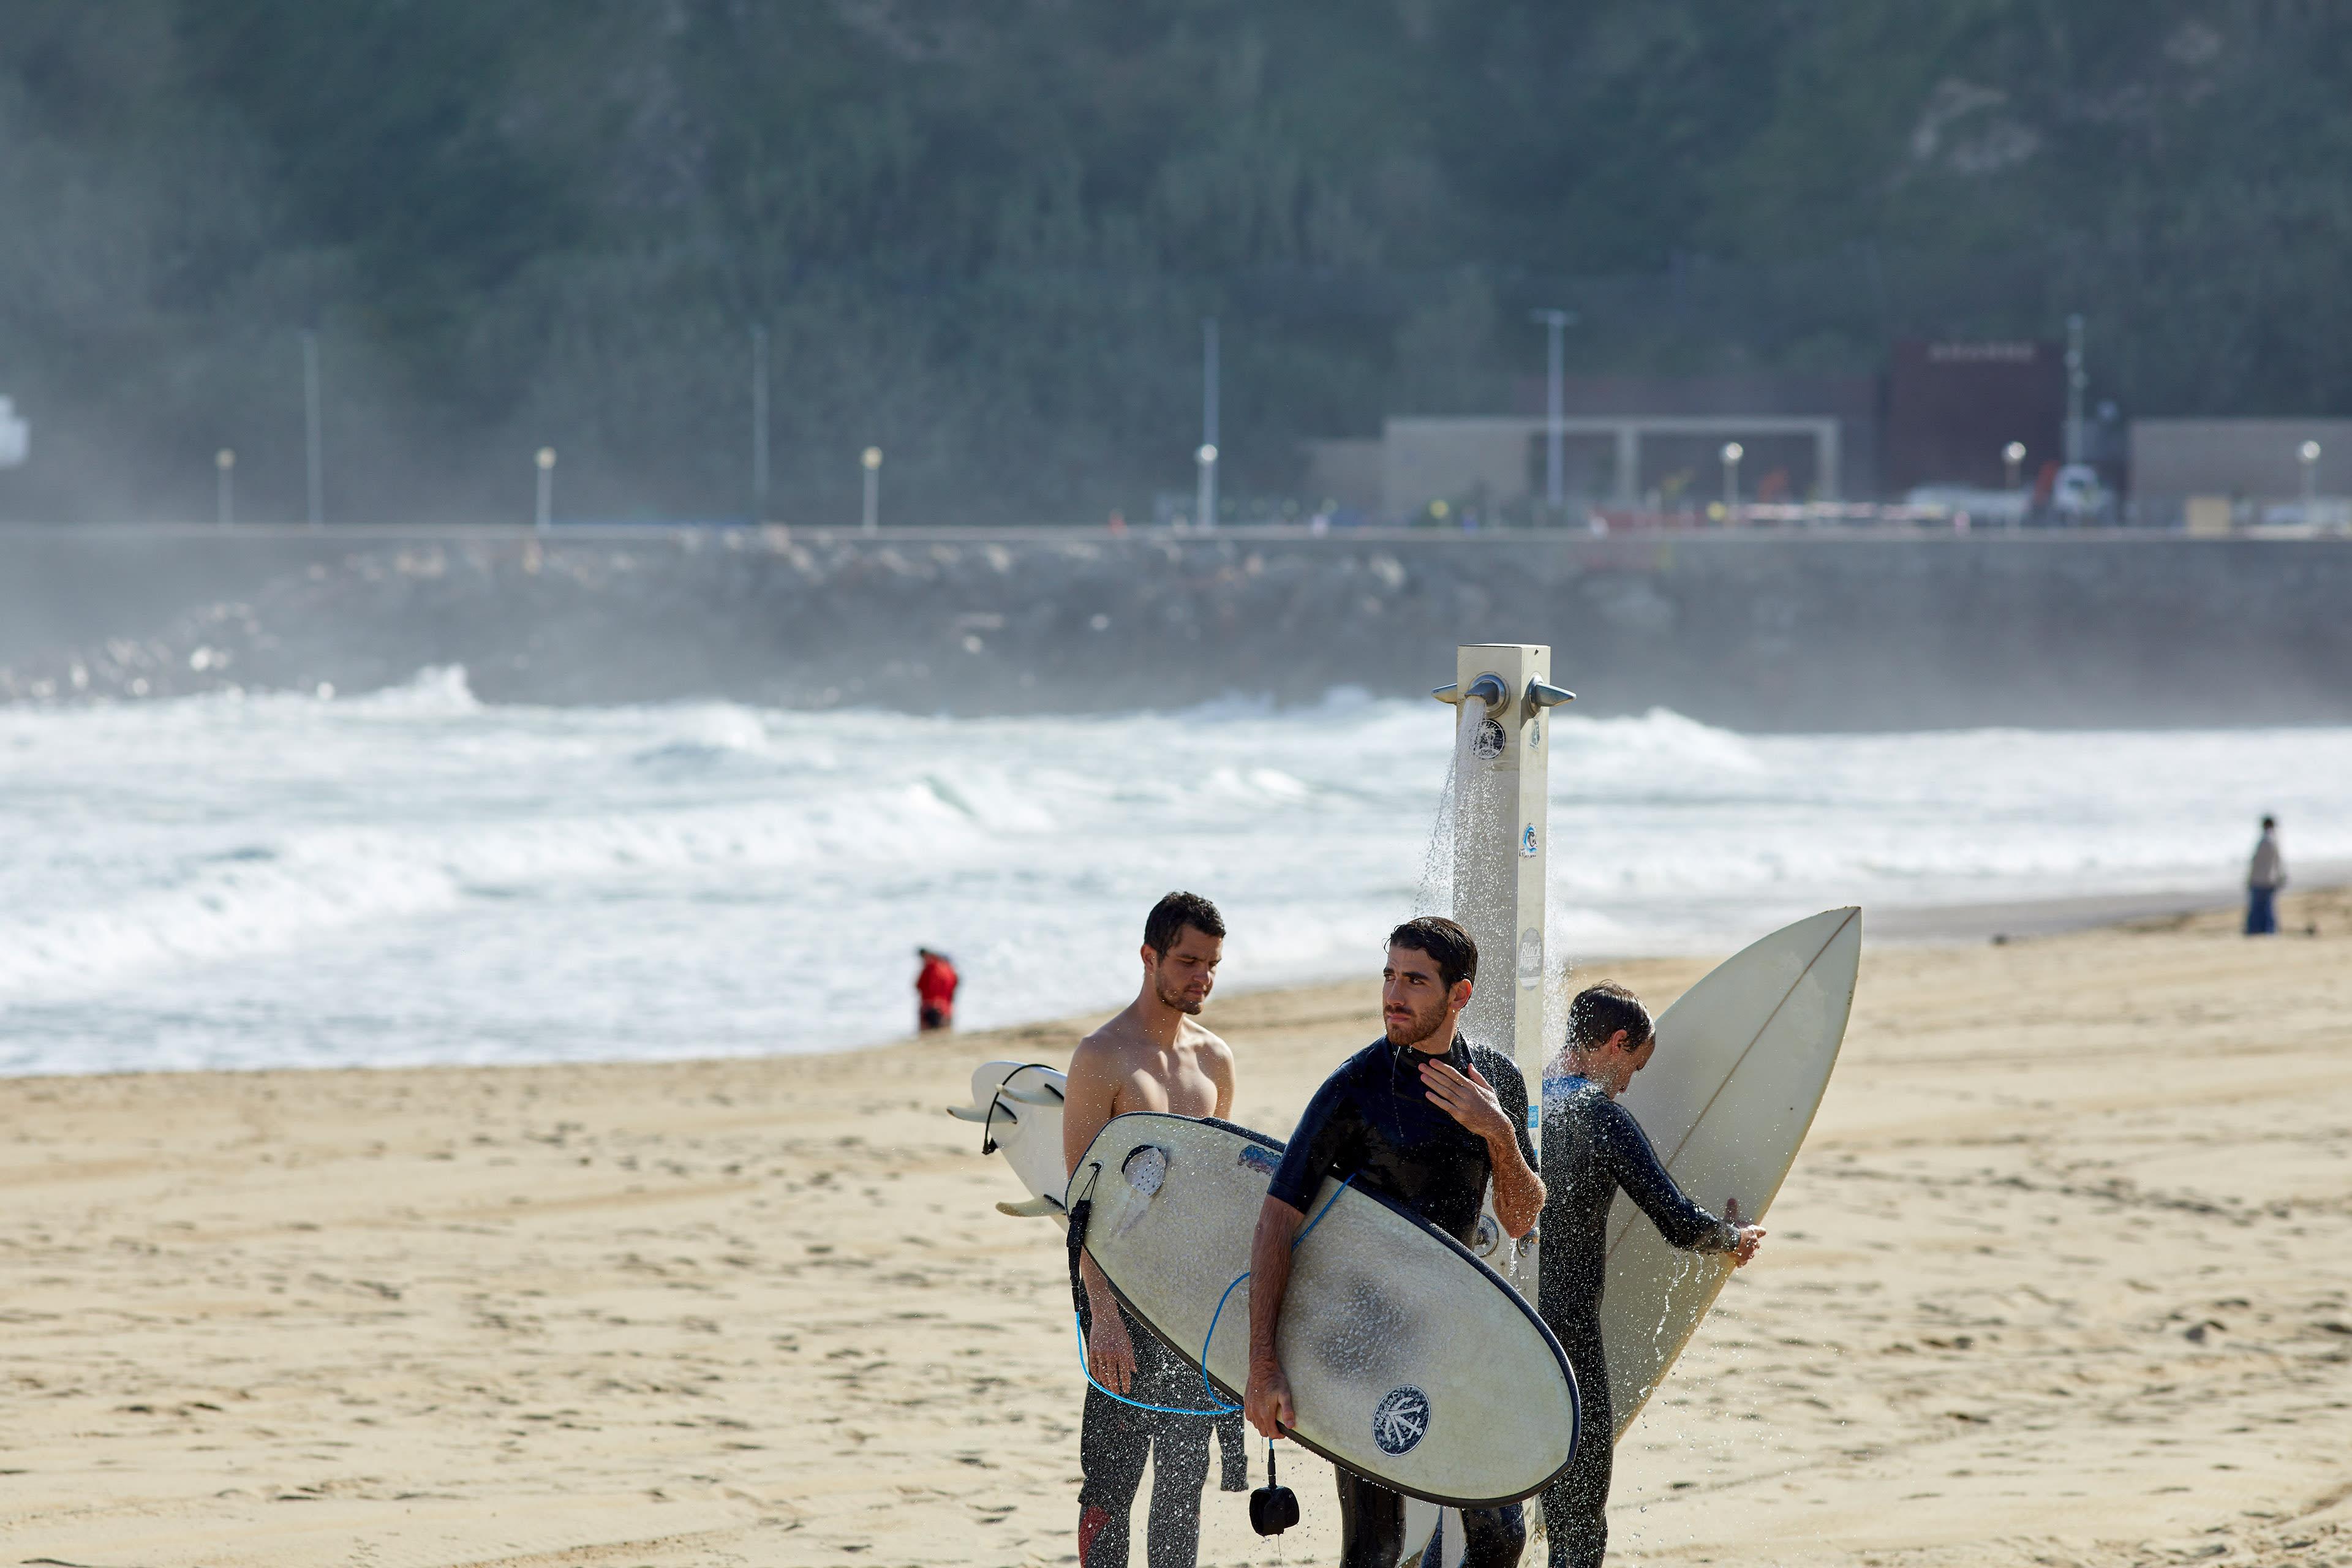 Richard Moran Beech Surf Skate Personal 009